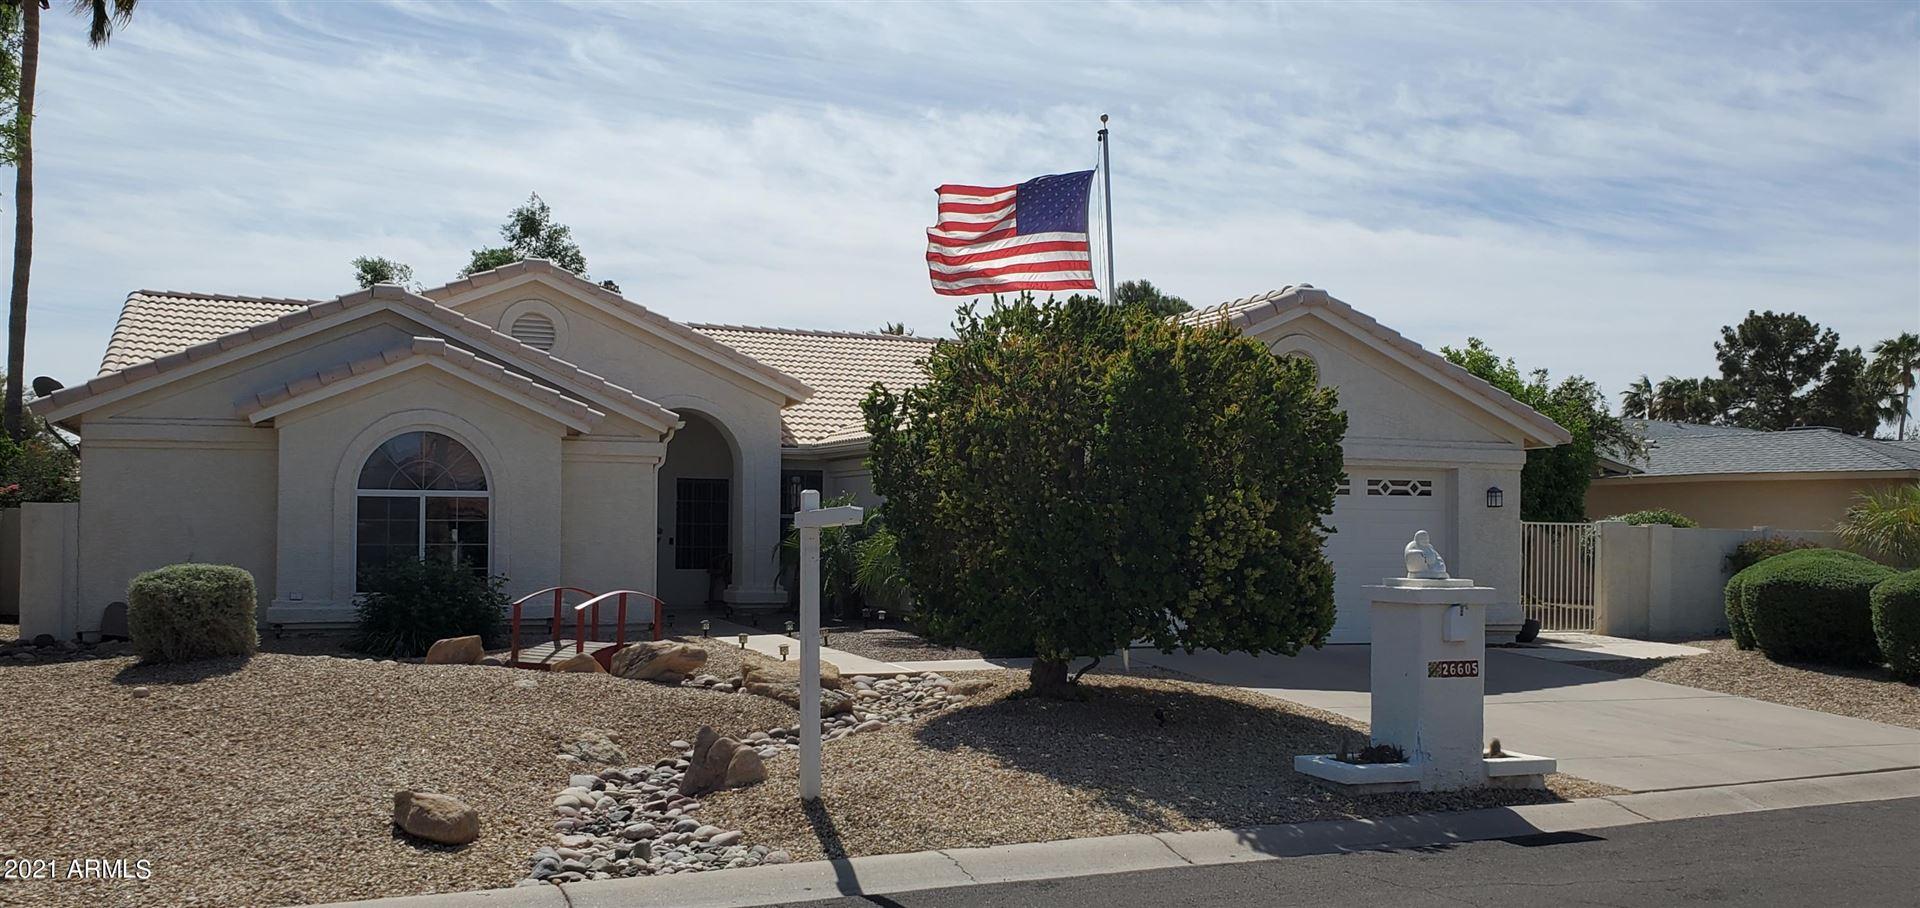 Photo of 26605 S EASTLAKE Drive, Sun Lakes, AZ 85248 (MLS # 6226101)